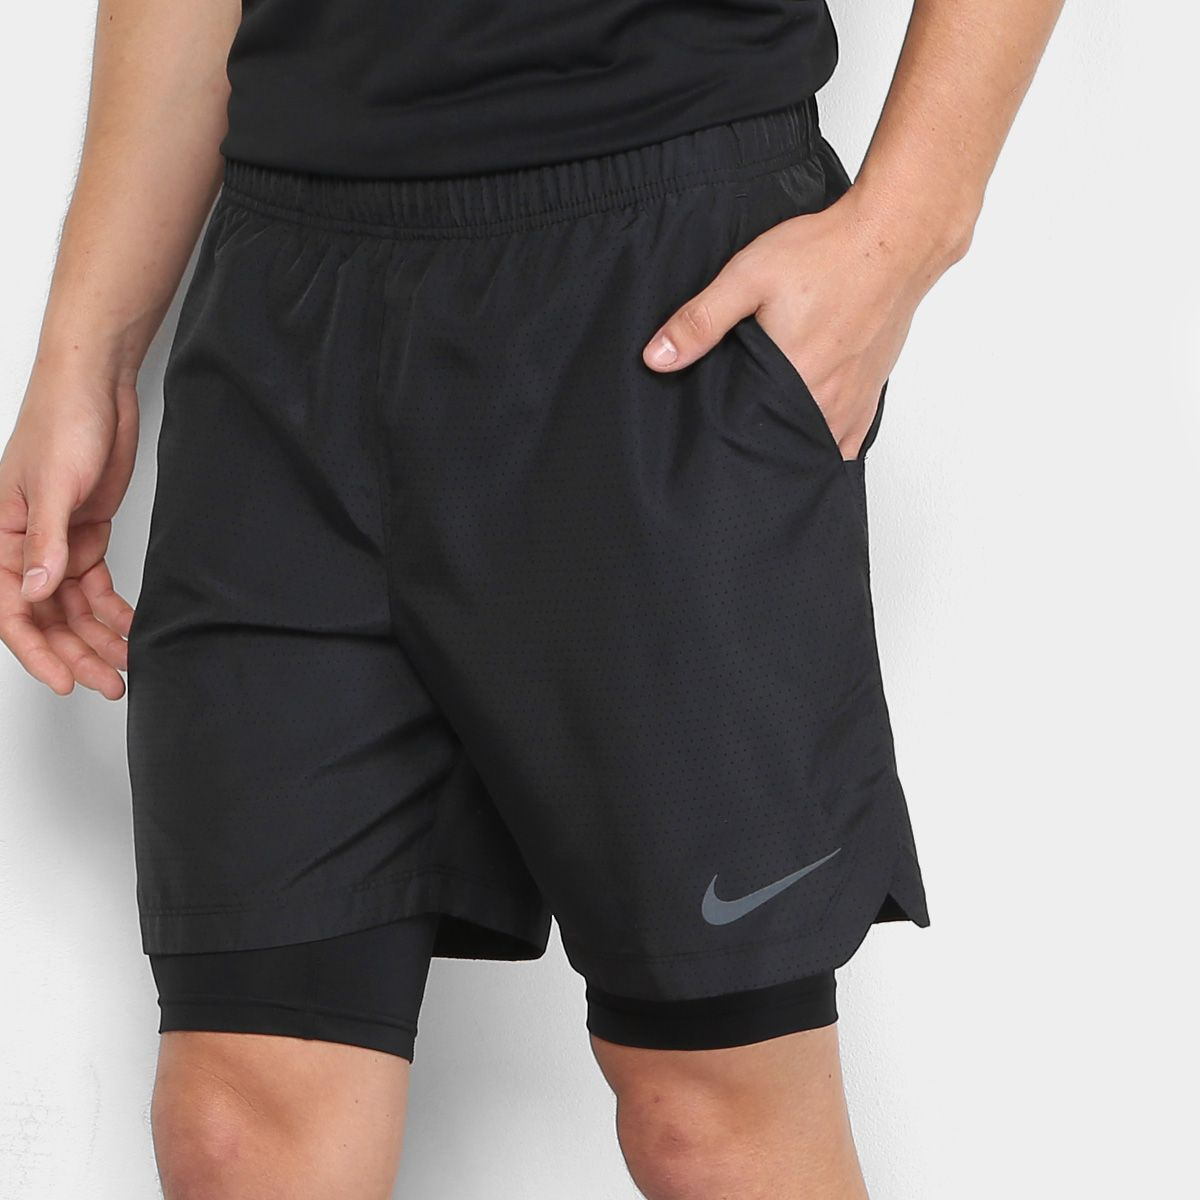 comprar oficial unos dias brillo encantador Bermuda Nike Challenger 2 em 1 7